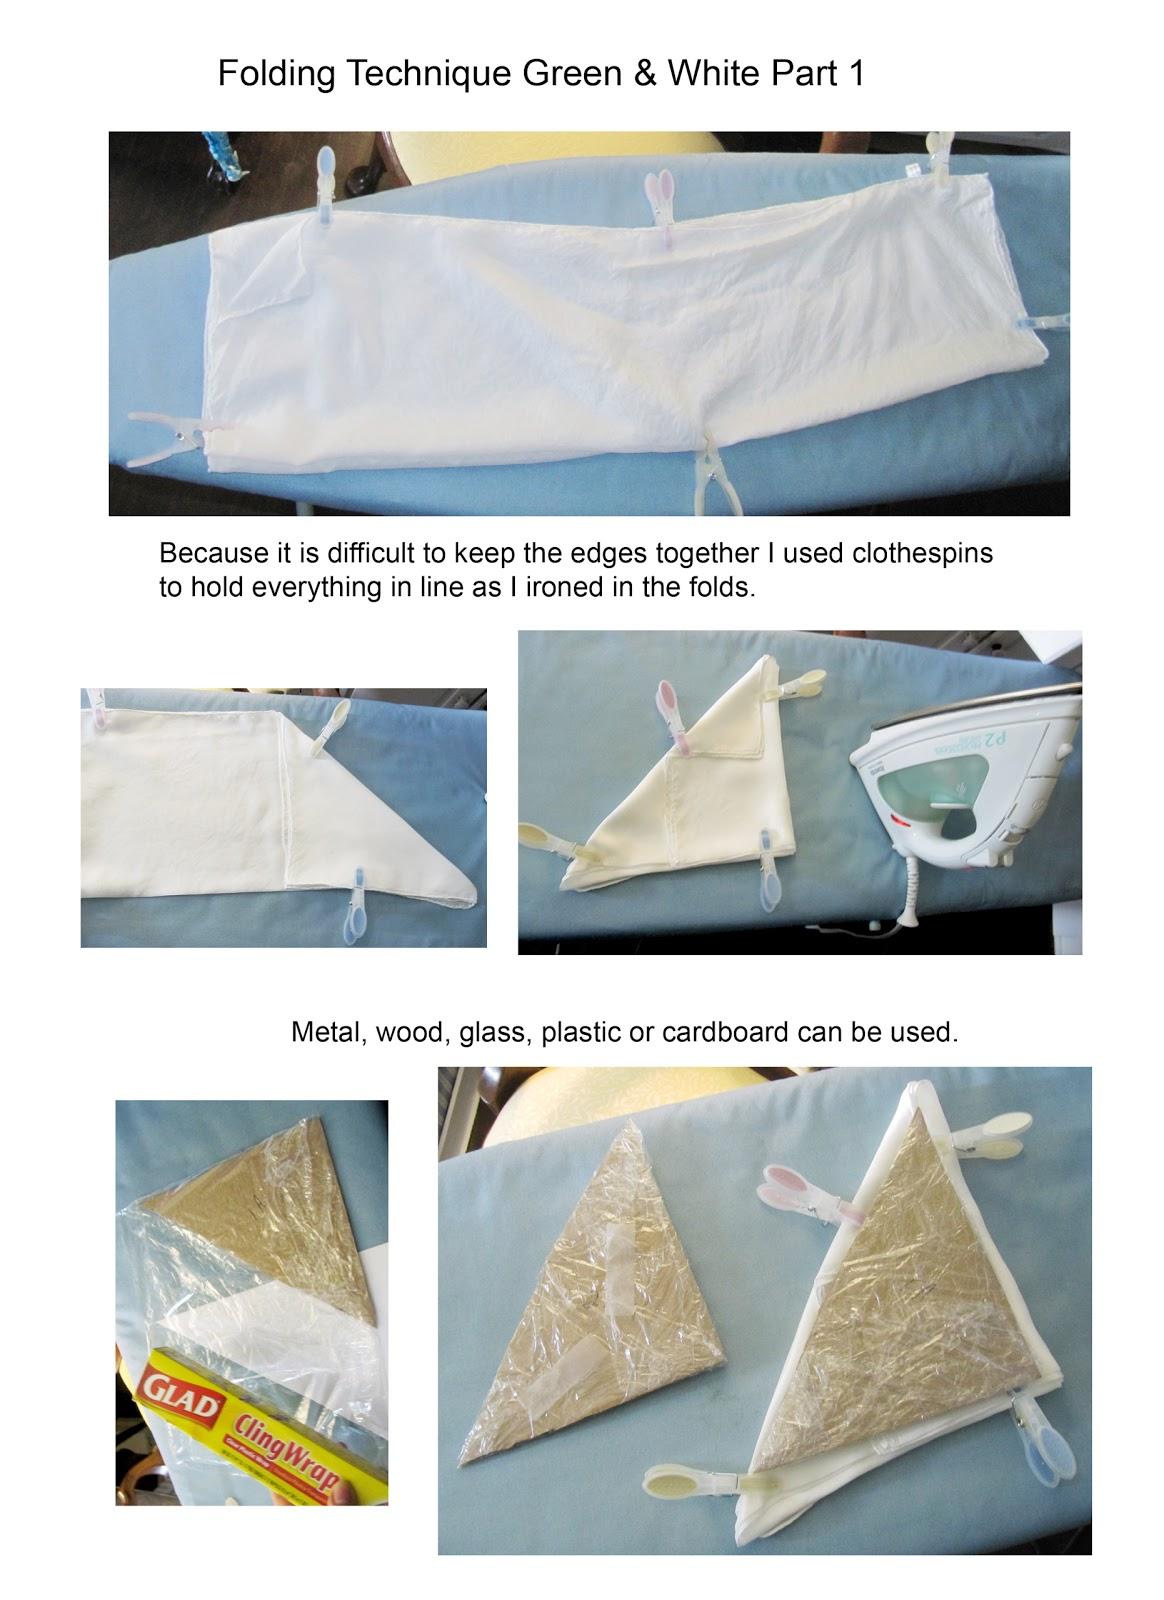 Deborahkatharine Capitol Hill Shibori Folding Technique